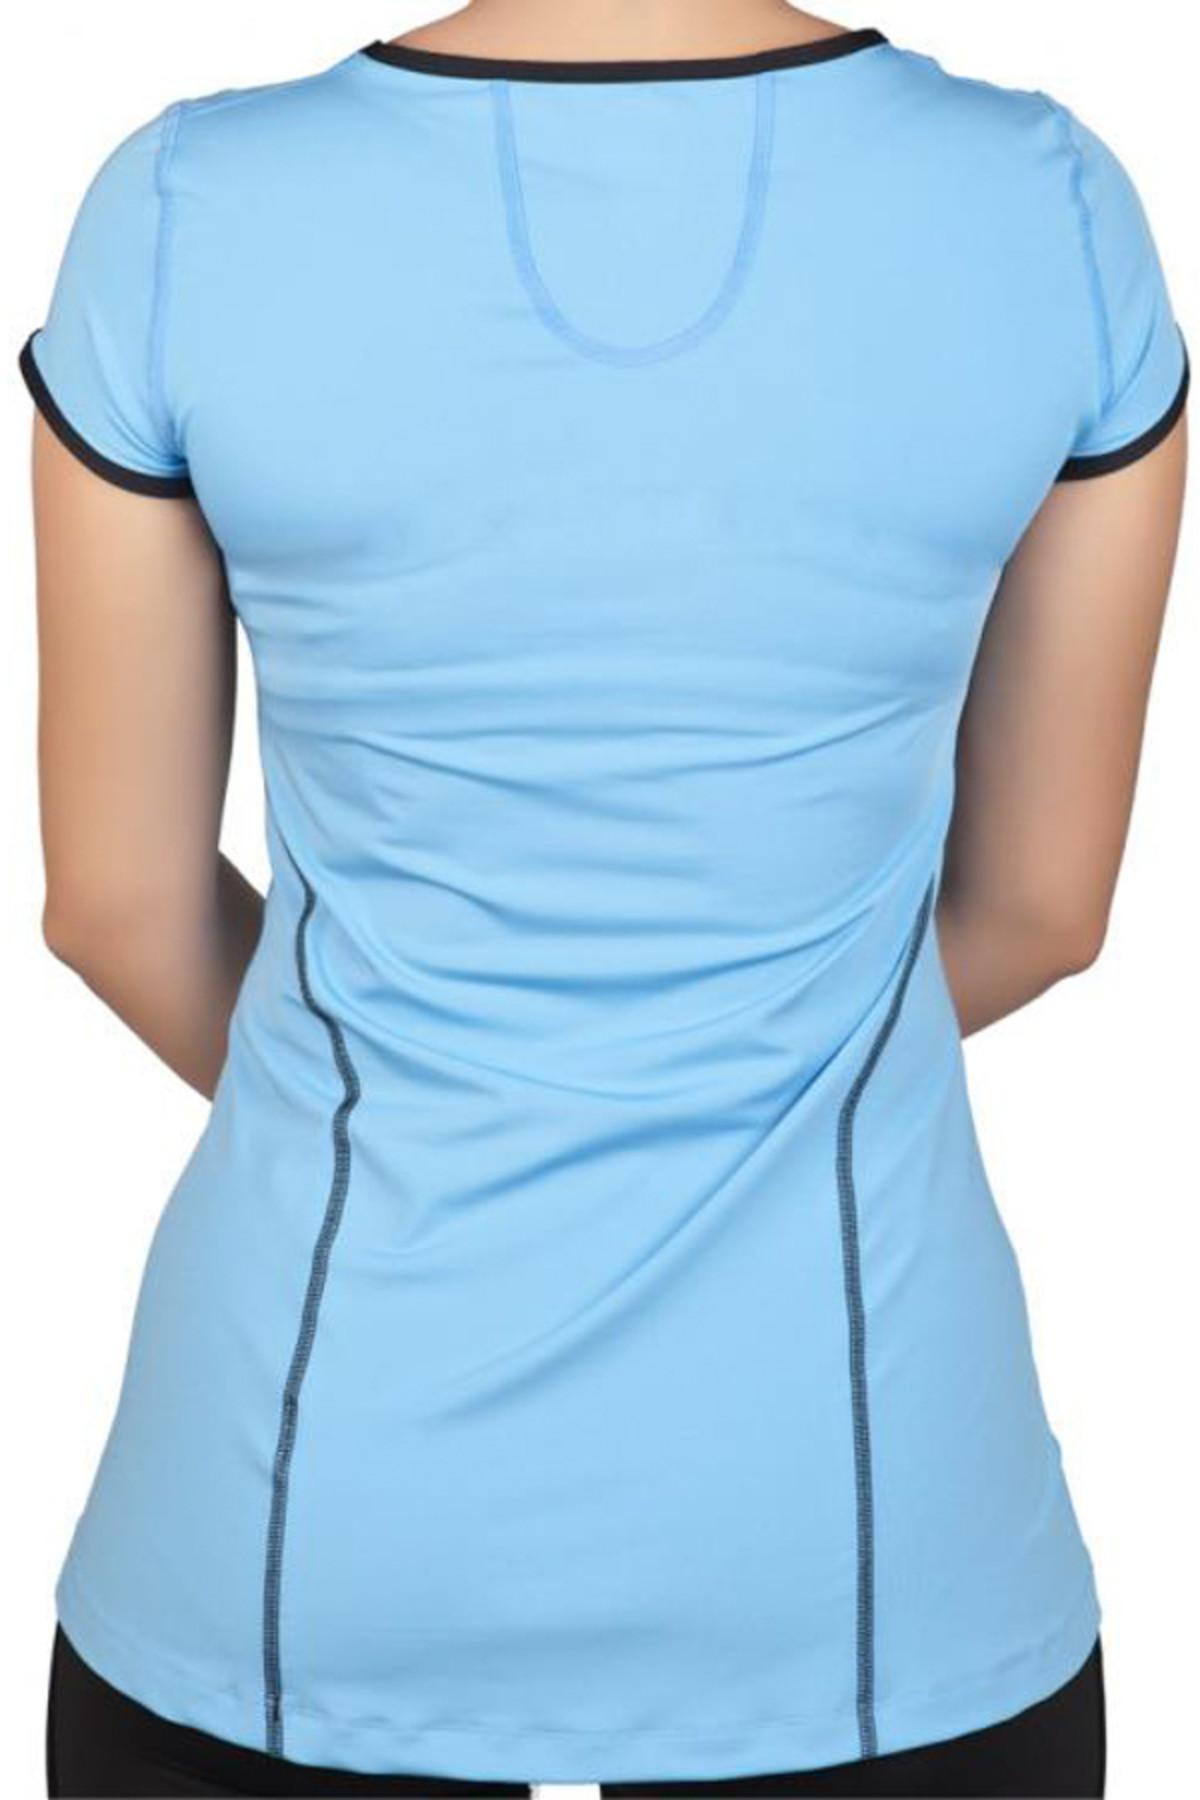 Exuma Kadın Mavi T-shirt - 142252 2